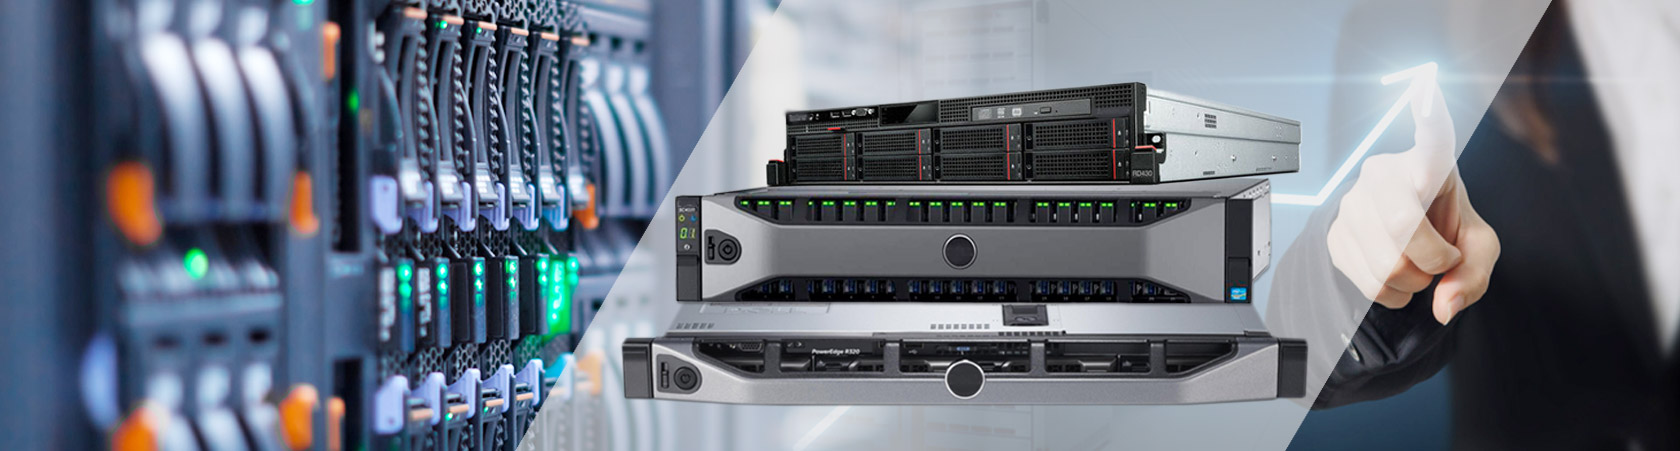 server-storage-New